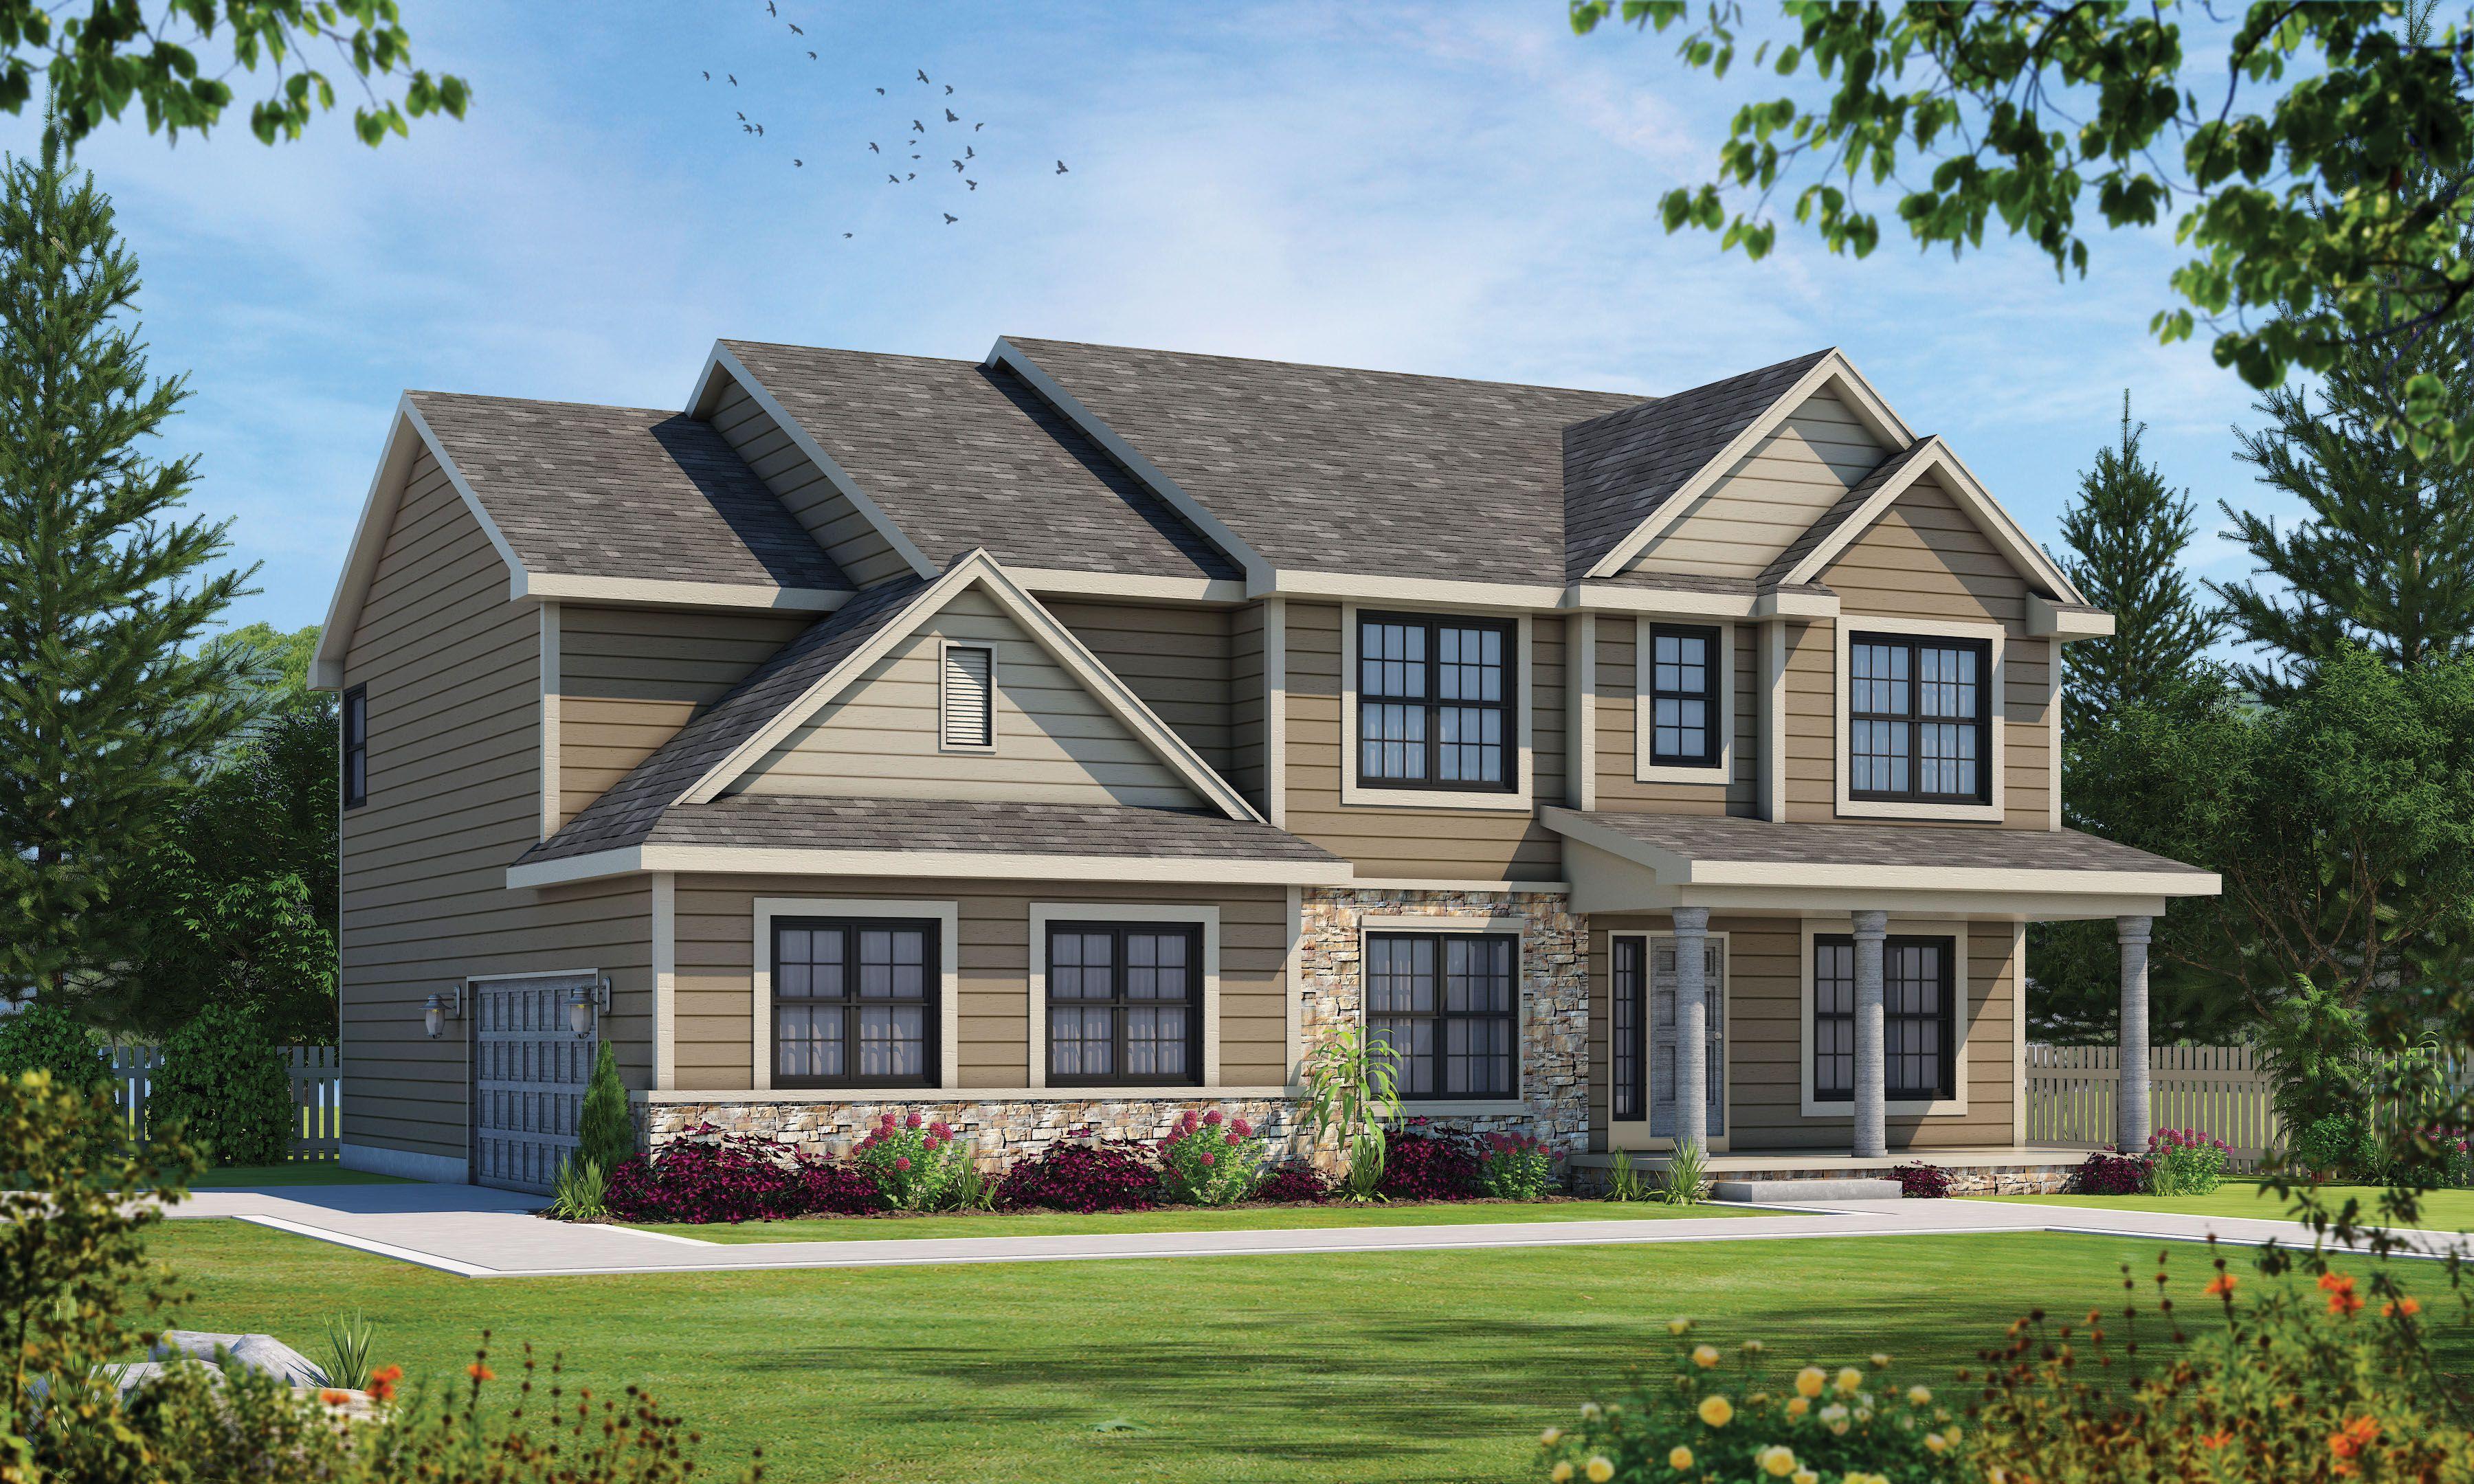 Plan View Design Basics Traditional House Plan Luxury House Plans Traditional House Plans